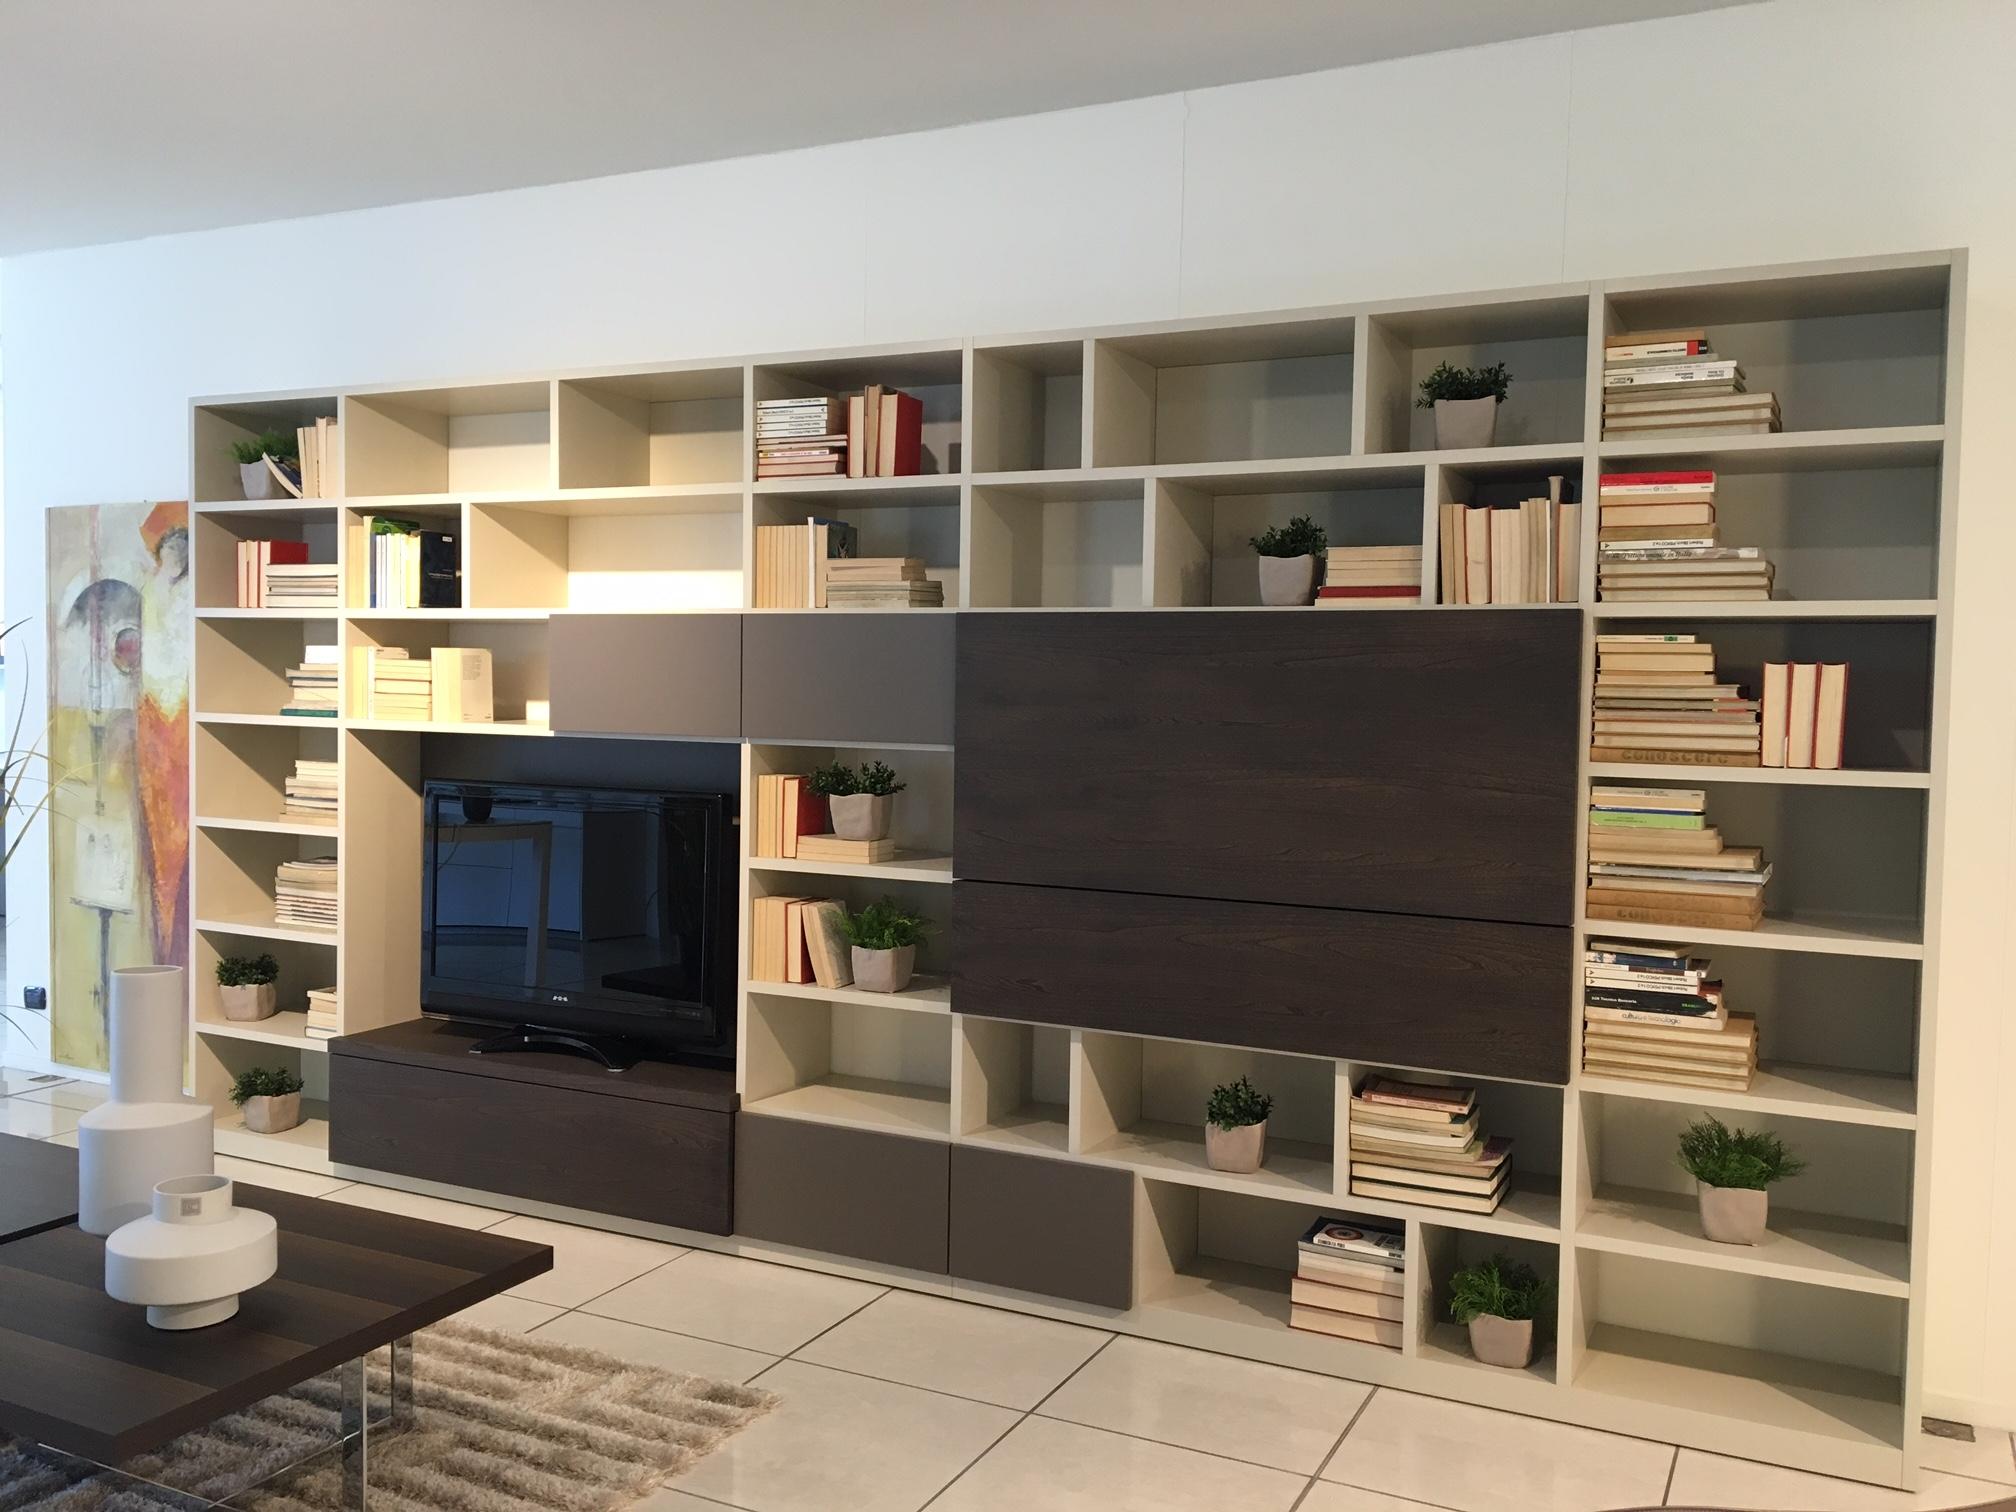 Emejing Molteni Soggiorni Photos - House Design Ideas 2018 - gunsho.us